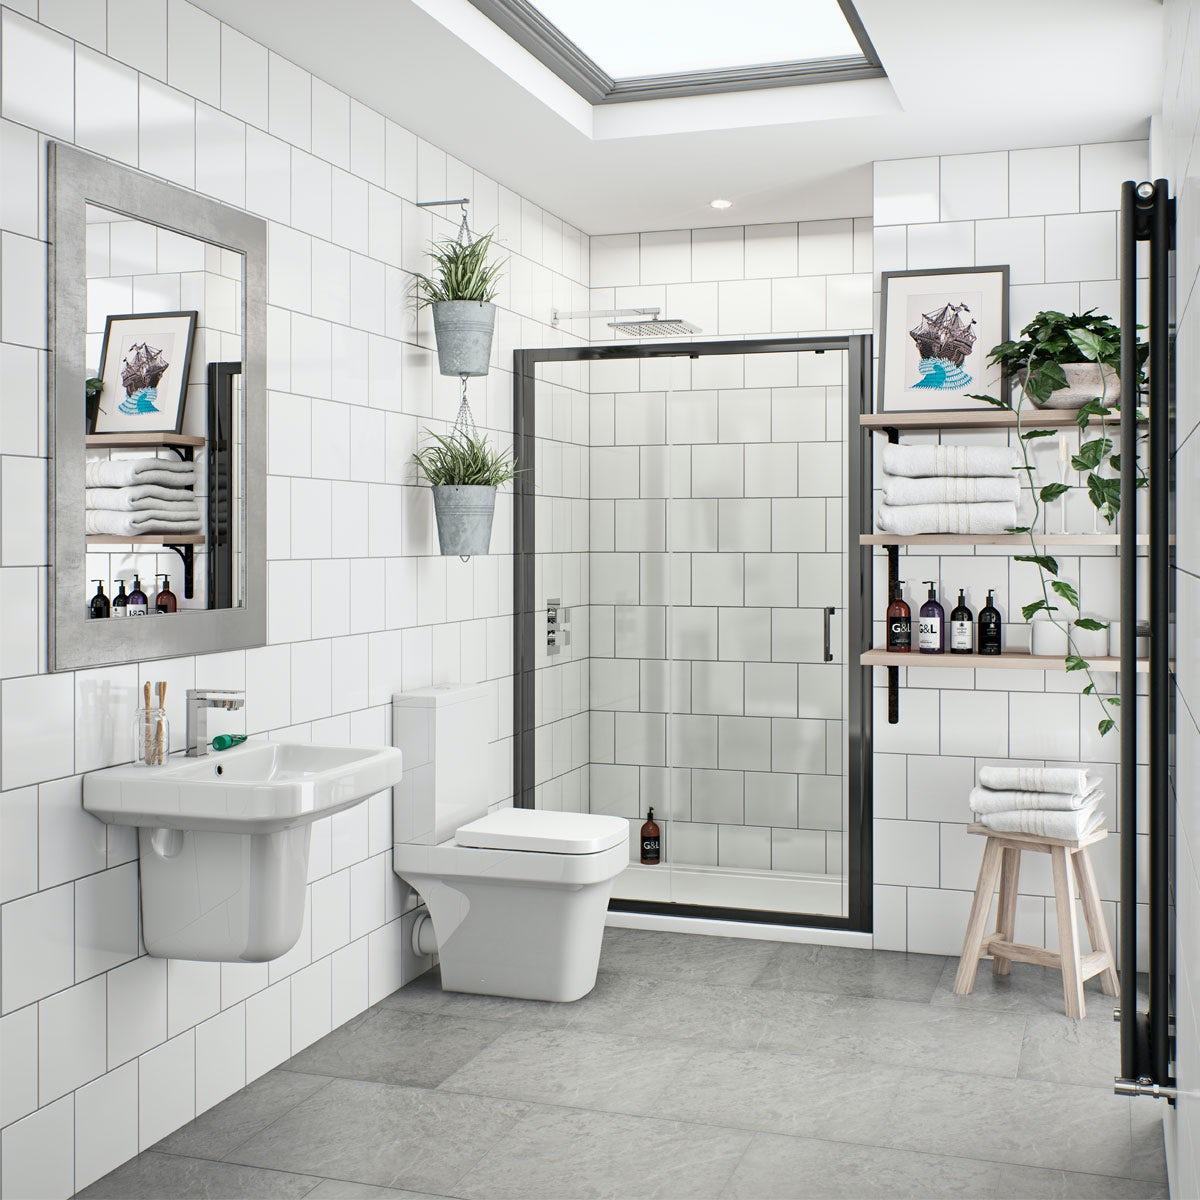 Mode Carter ensuite suite with 6mm shower door, tap and shower set